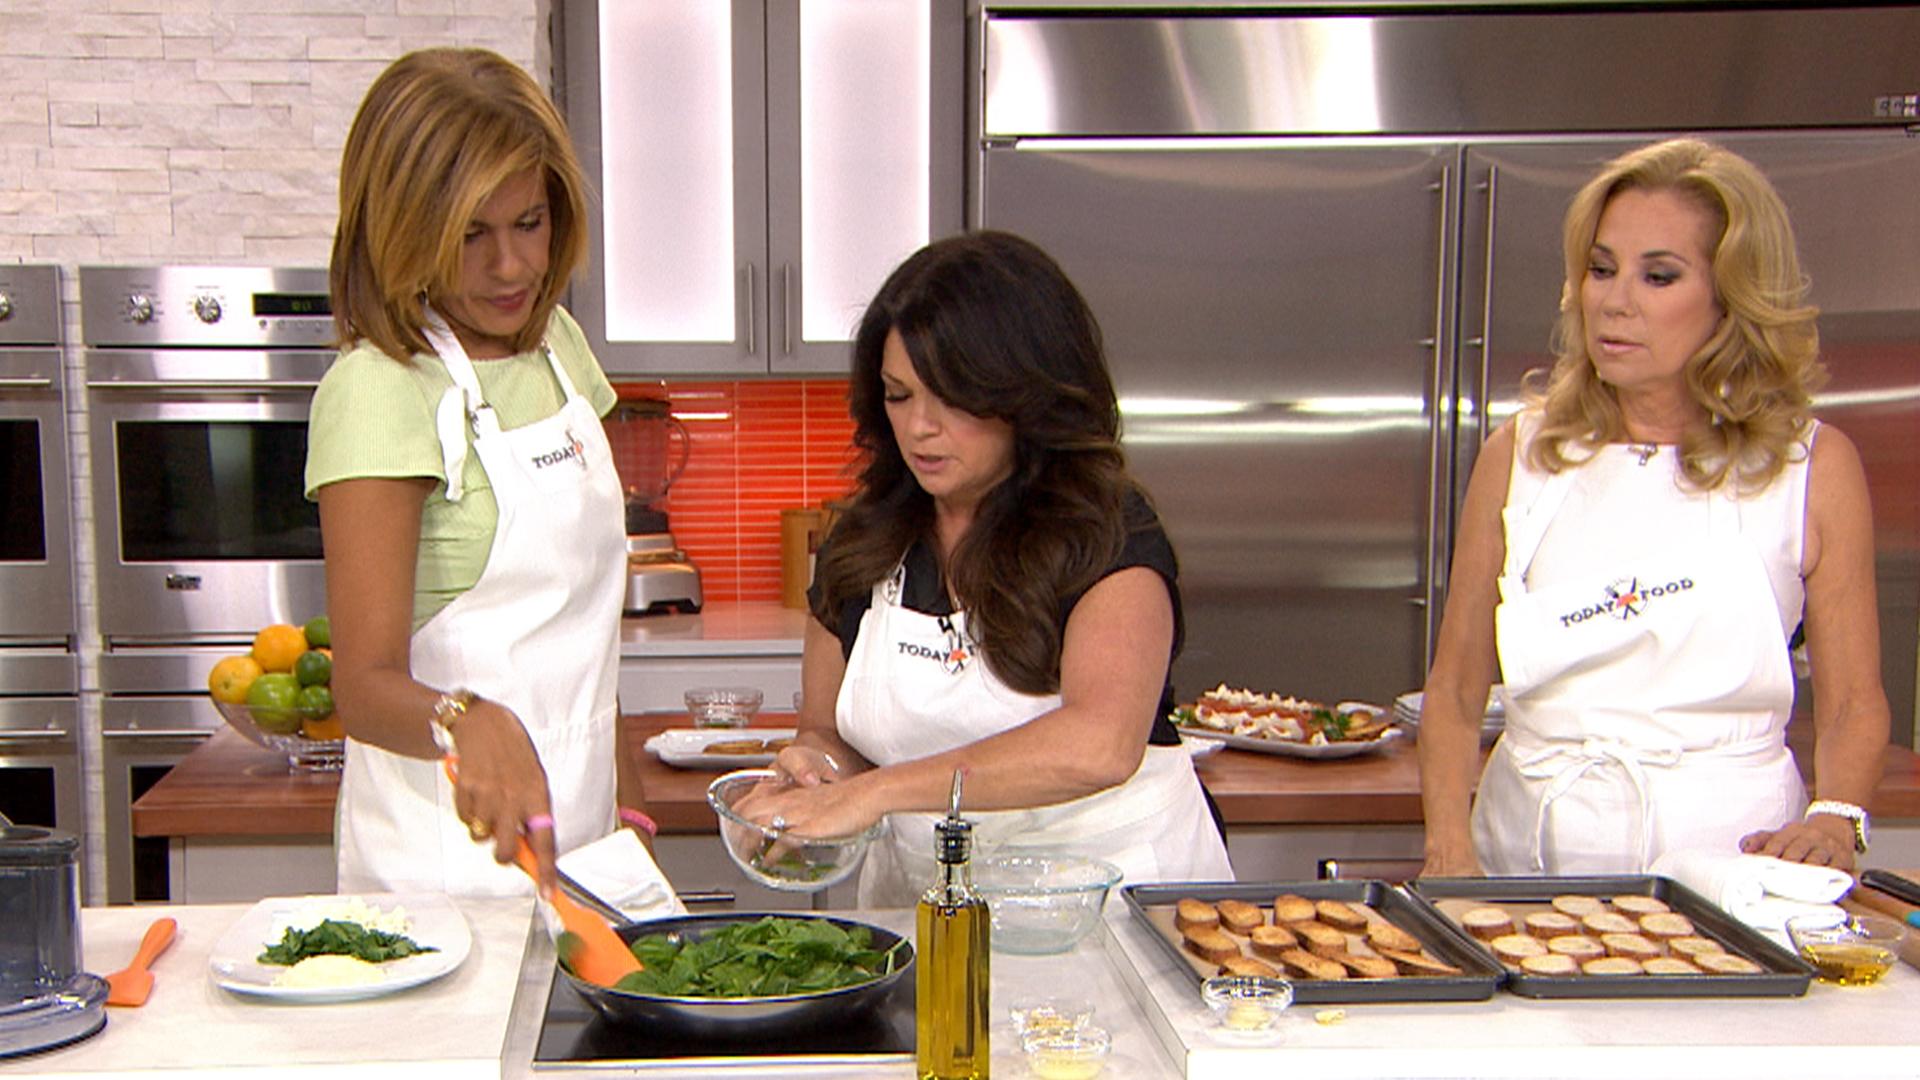 Valerie Bertinelli Show On Food Network